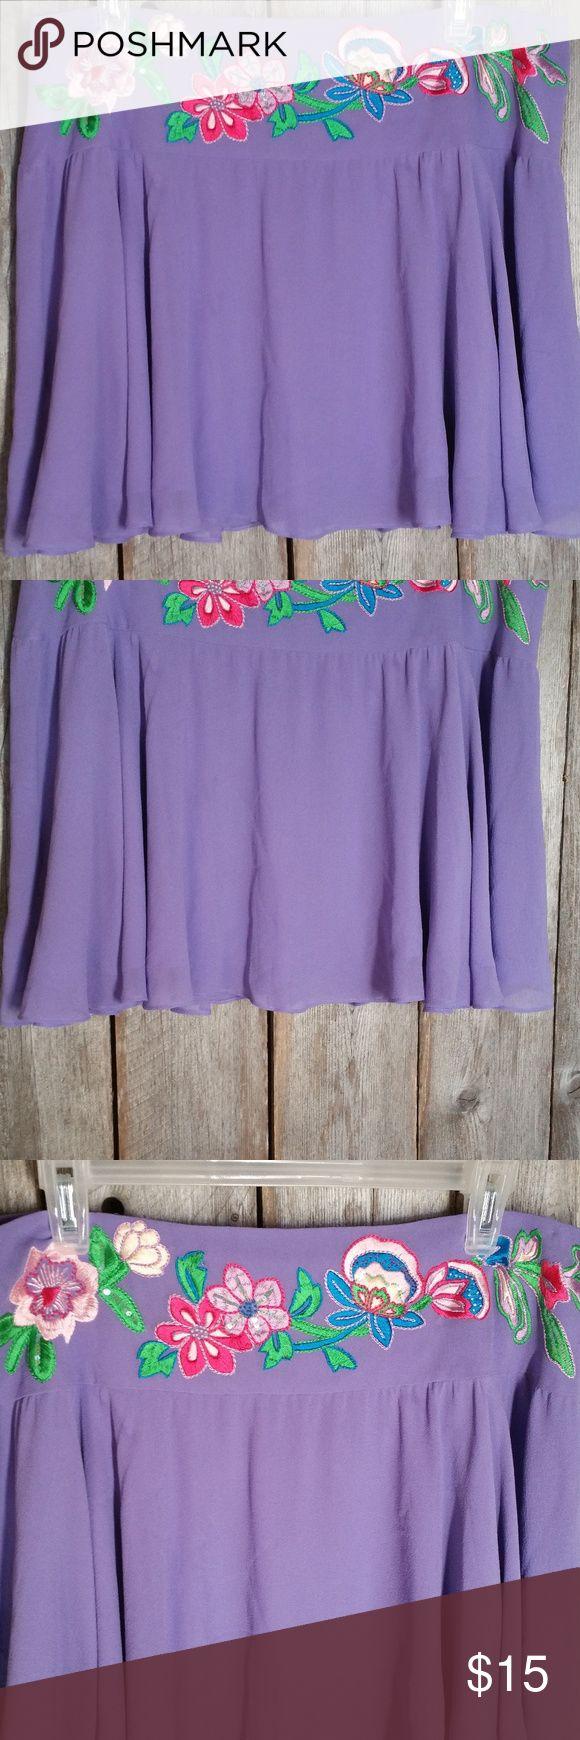 Moda International 12 Mini Skirt Purple Silk Moda International 12 Mini Skirt Women's Purple Silk Embroidered Skater Boho Gently used Back zipper closure Lined 100% silk Approx waist 34 and 16 in length Moda International Skirts Mini